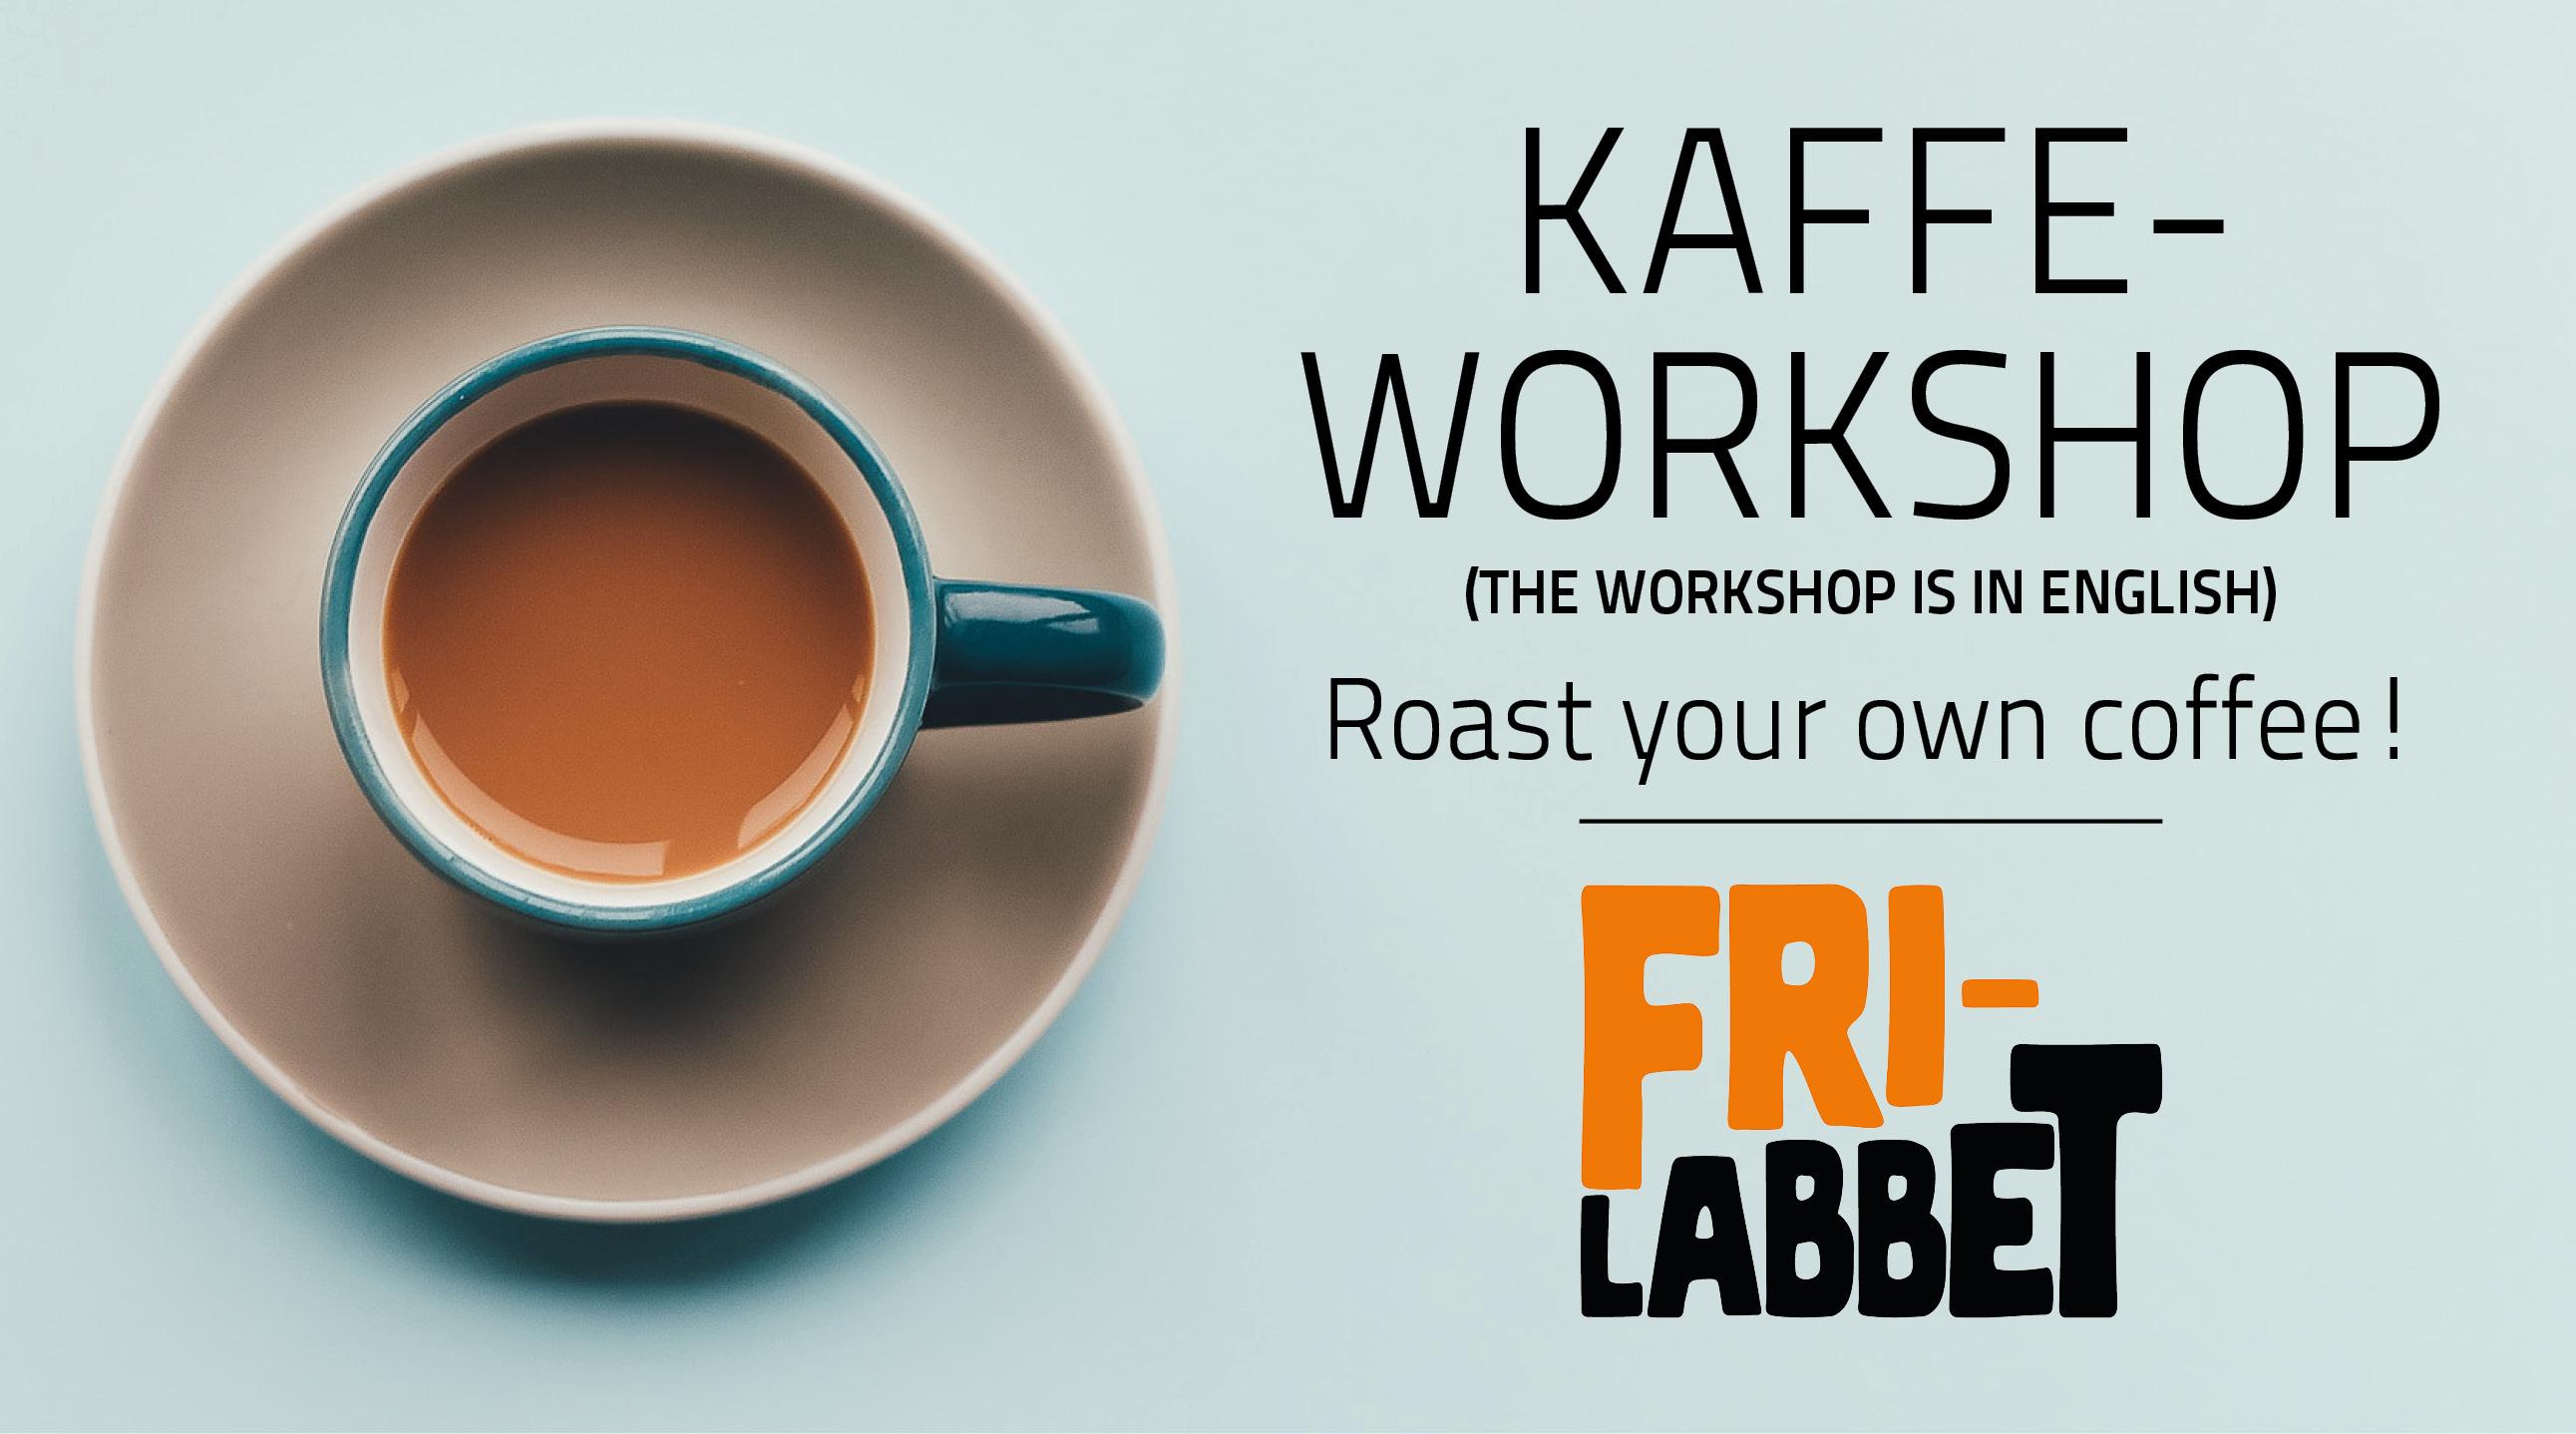 Kaffeworkshop: Roast your own coffee!